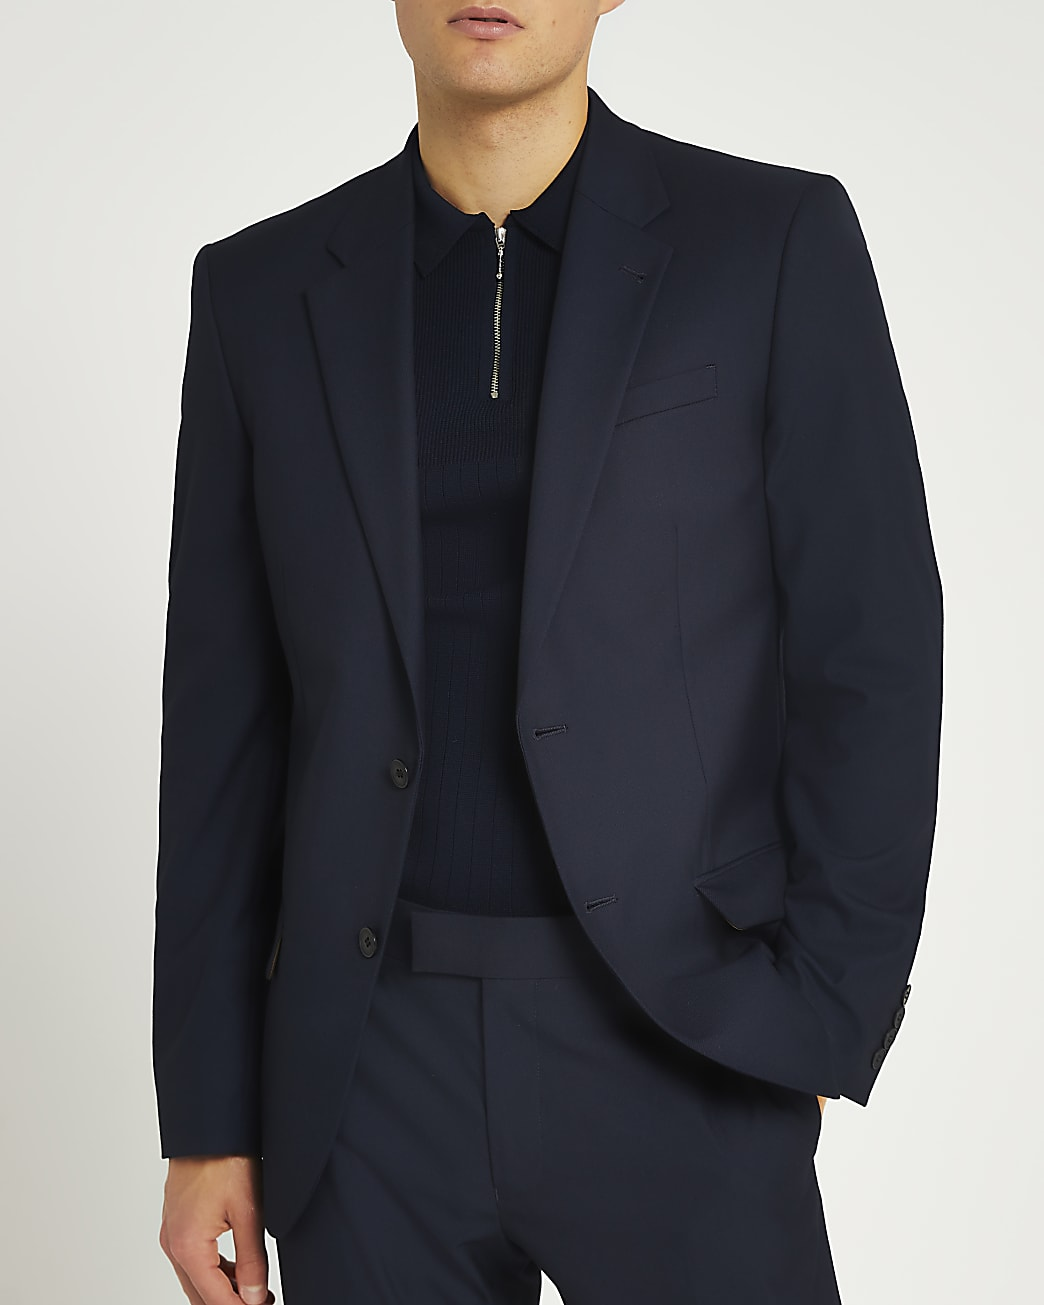 Navy slim fit twill suit jacket